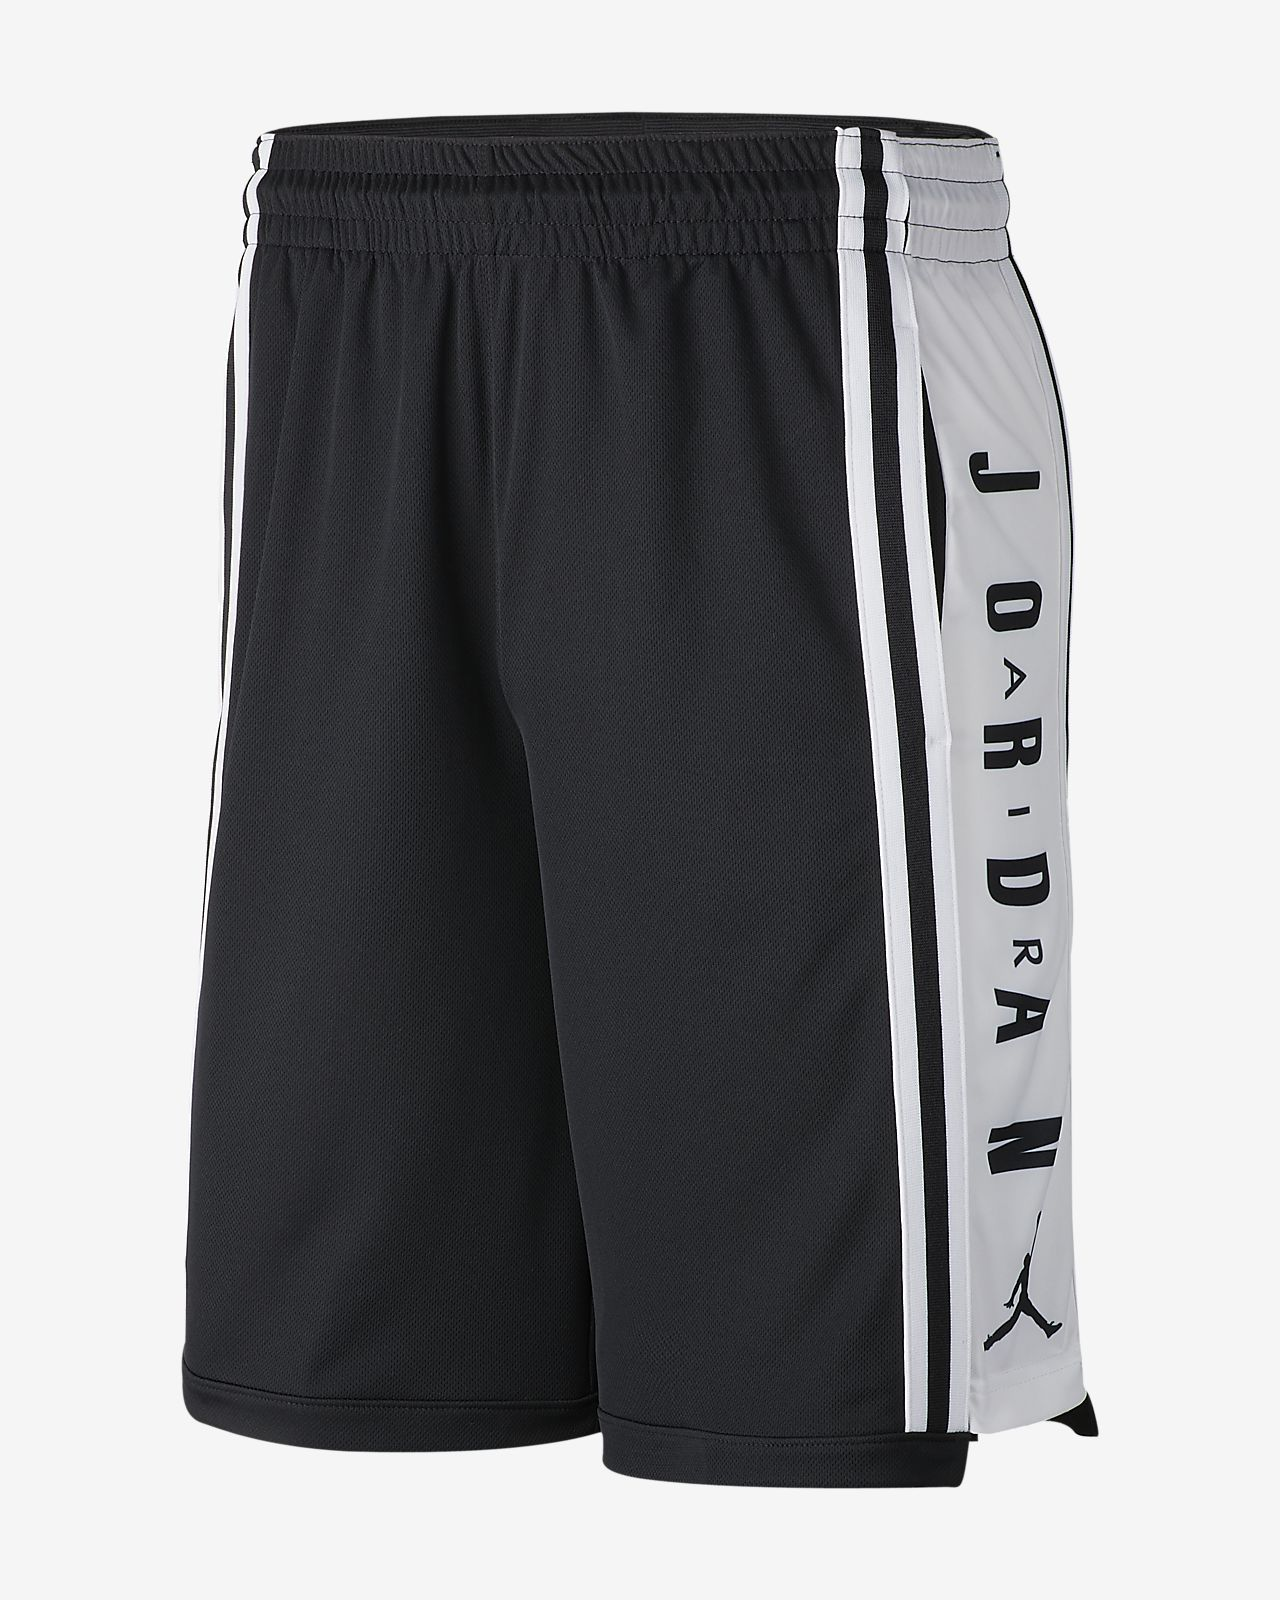 reputable site 7bc78 9f7af Jordan Pantalón corto de baloncesto - Hombre